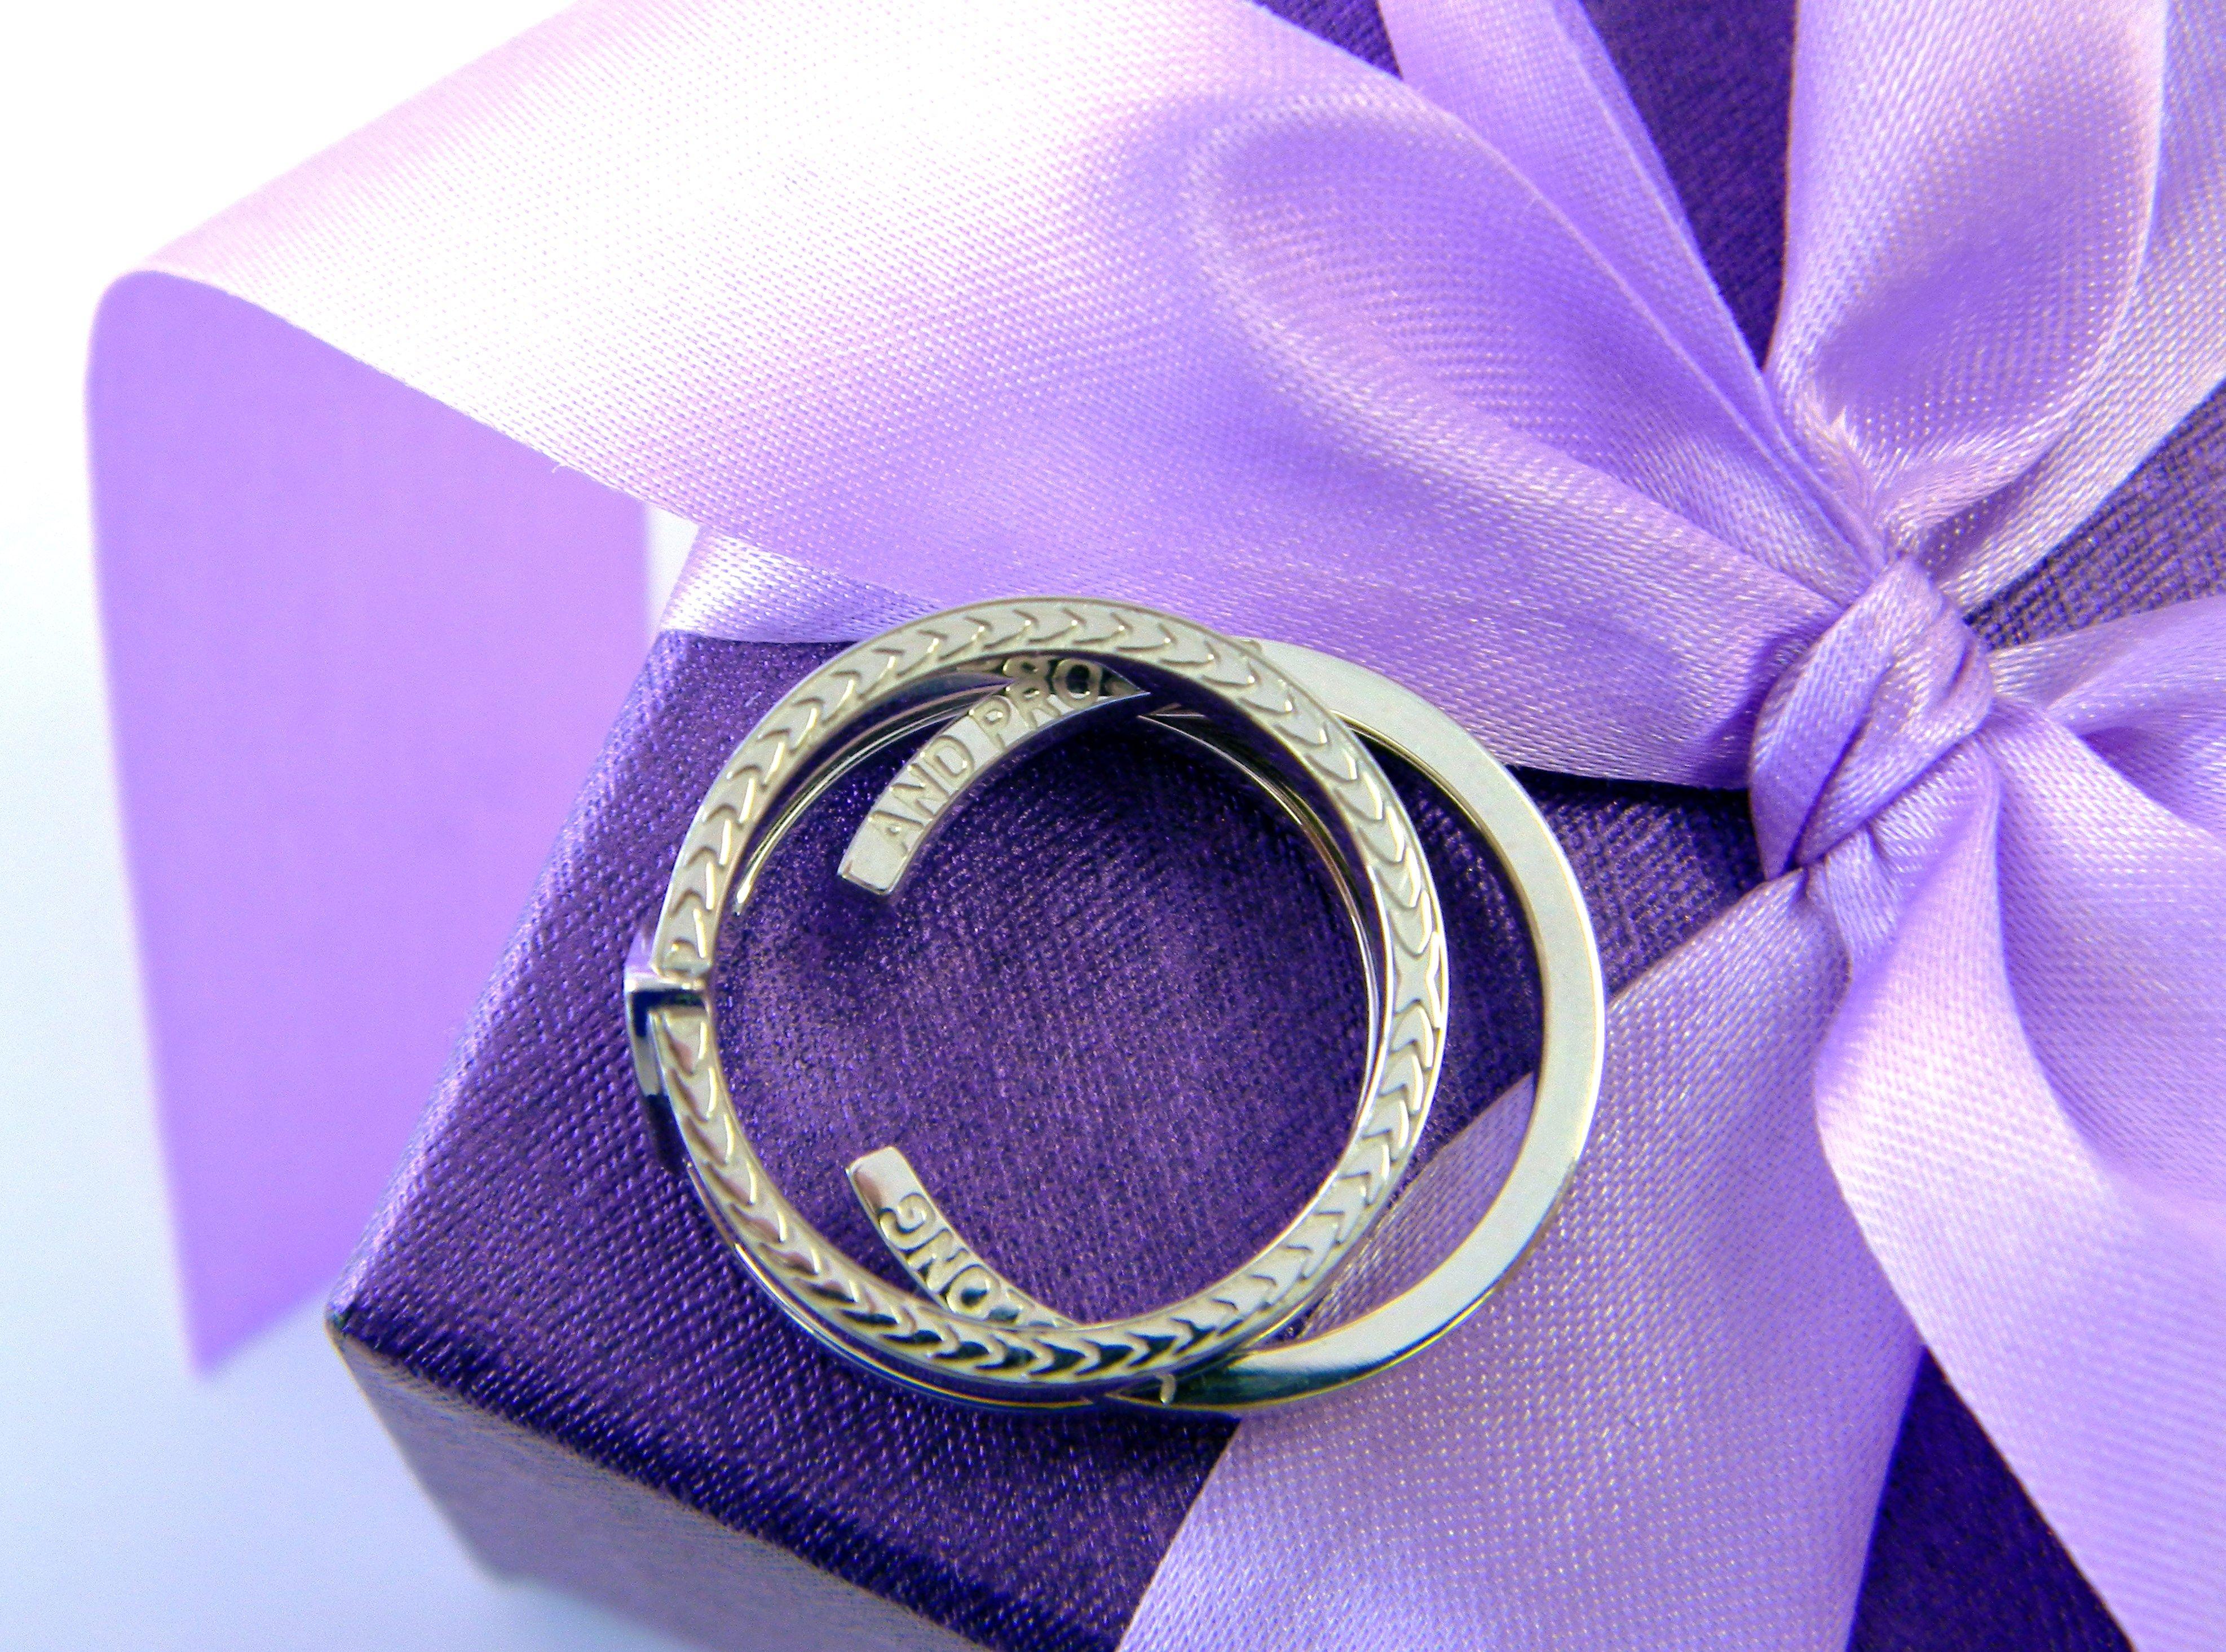 The Star Trek Ring This beautifully custom designed Mens